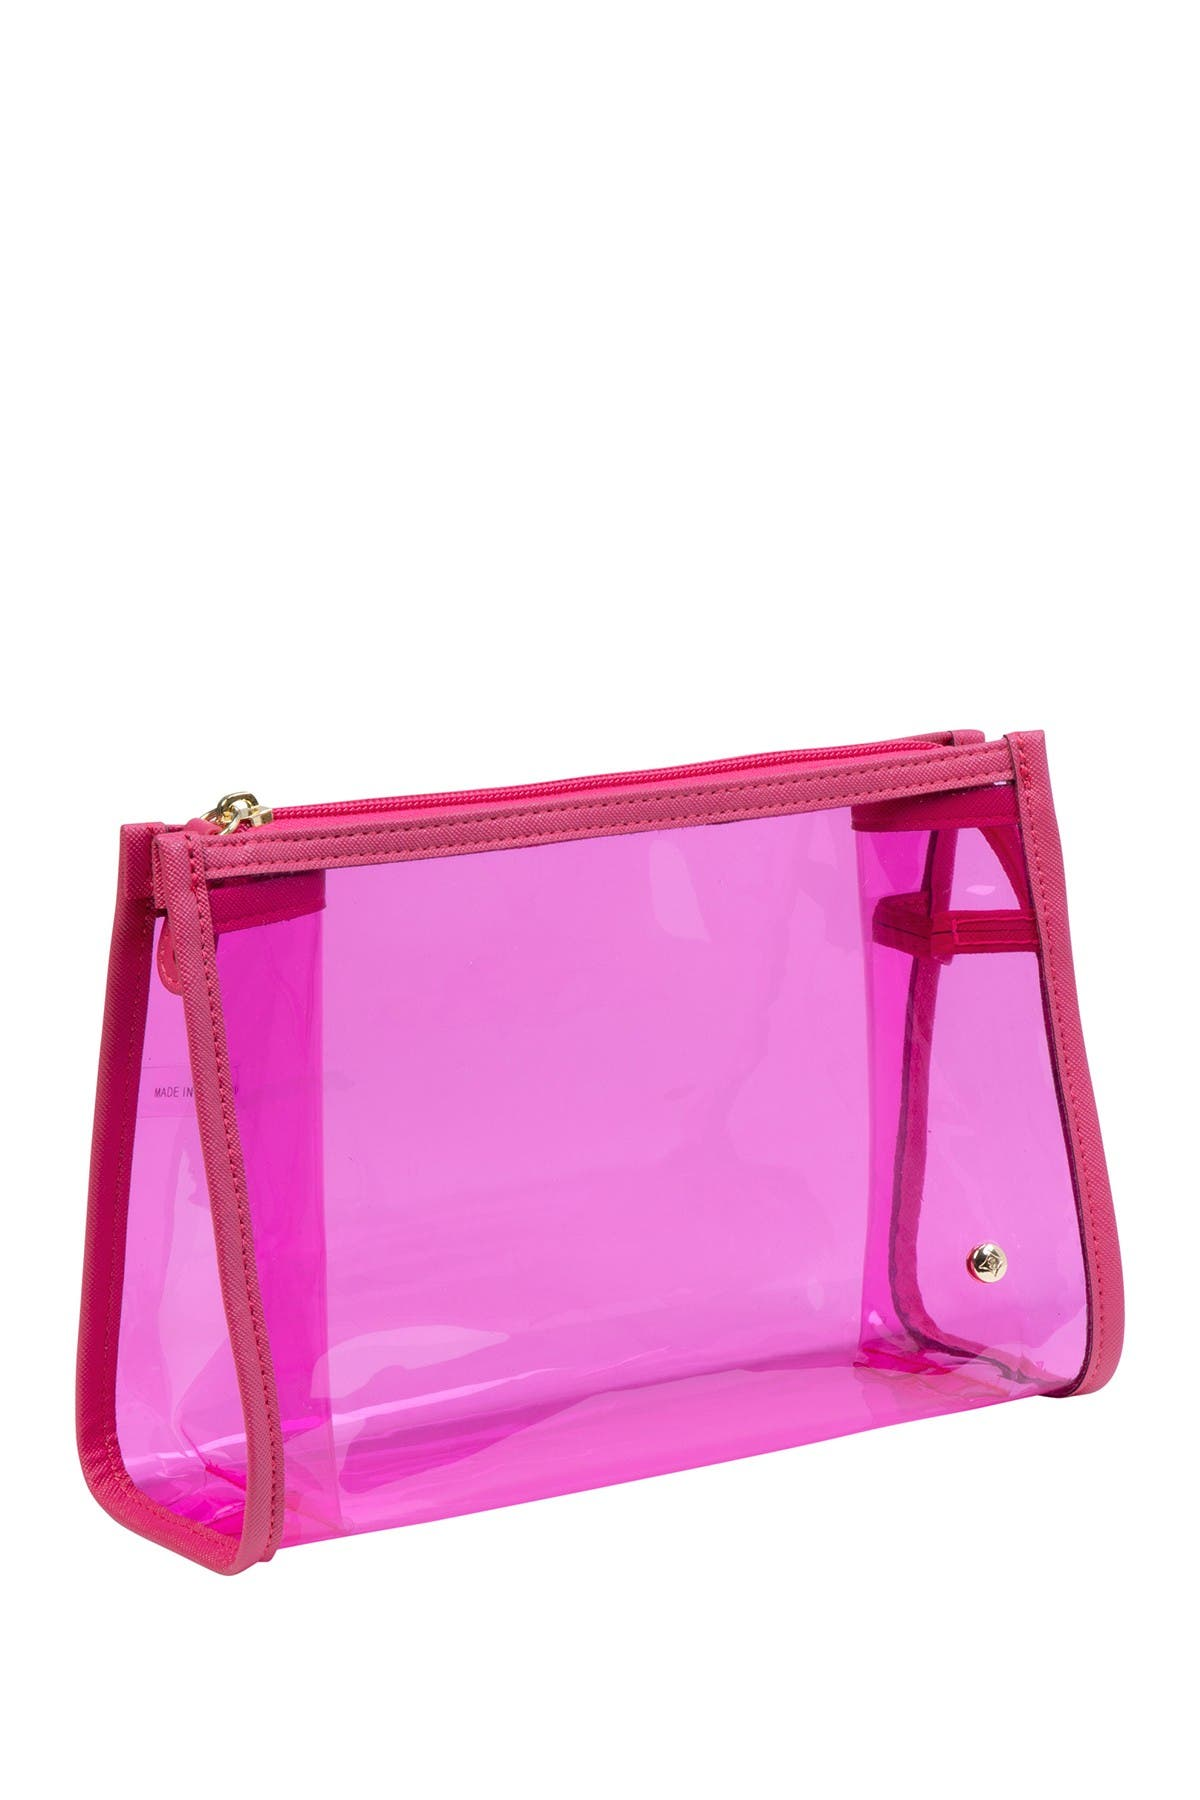 Image of Stephanie Johnson Miami Medium Zip Cosmetic Case - Raspberry